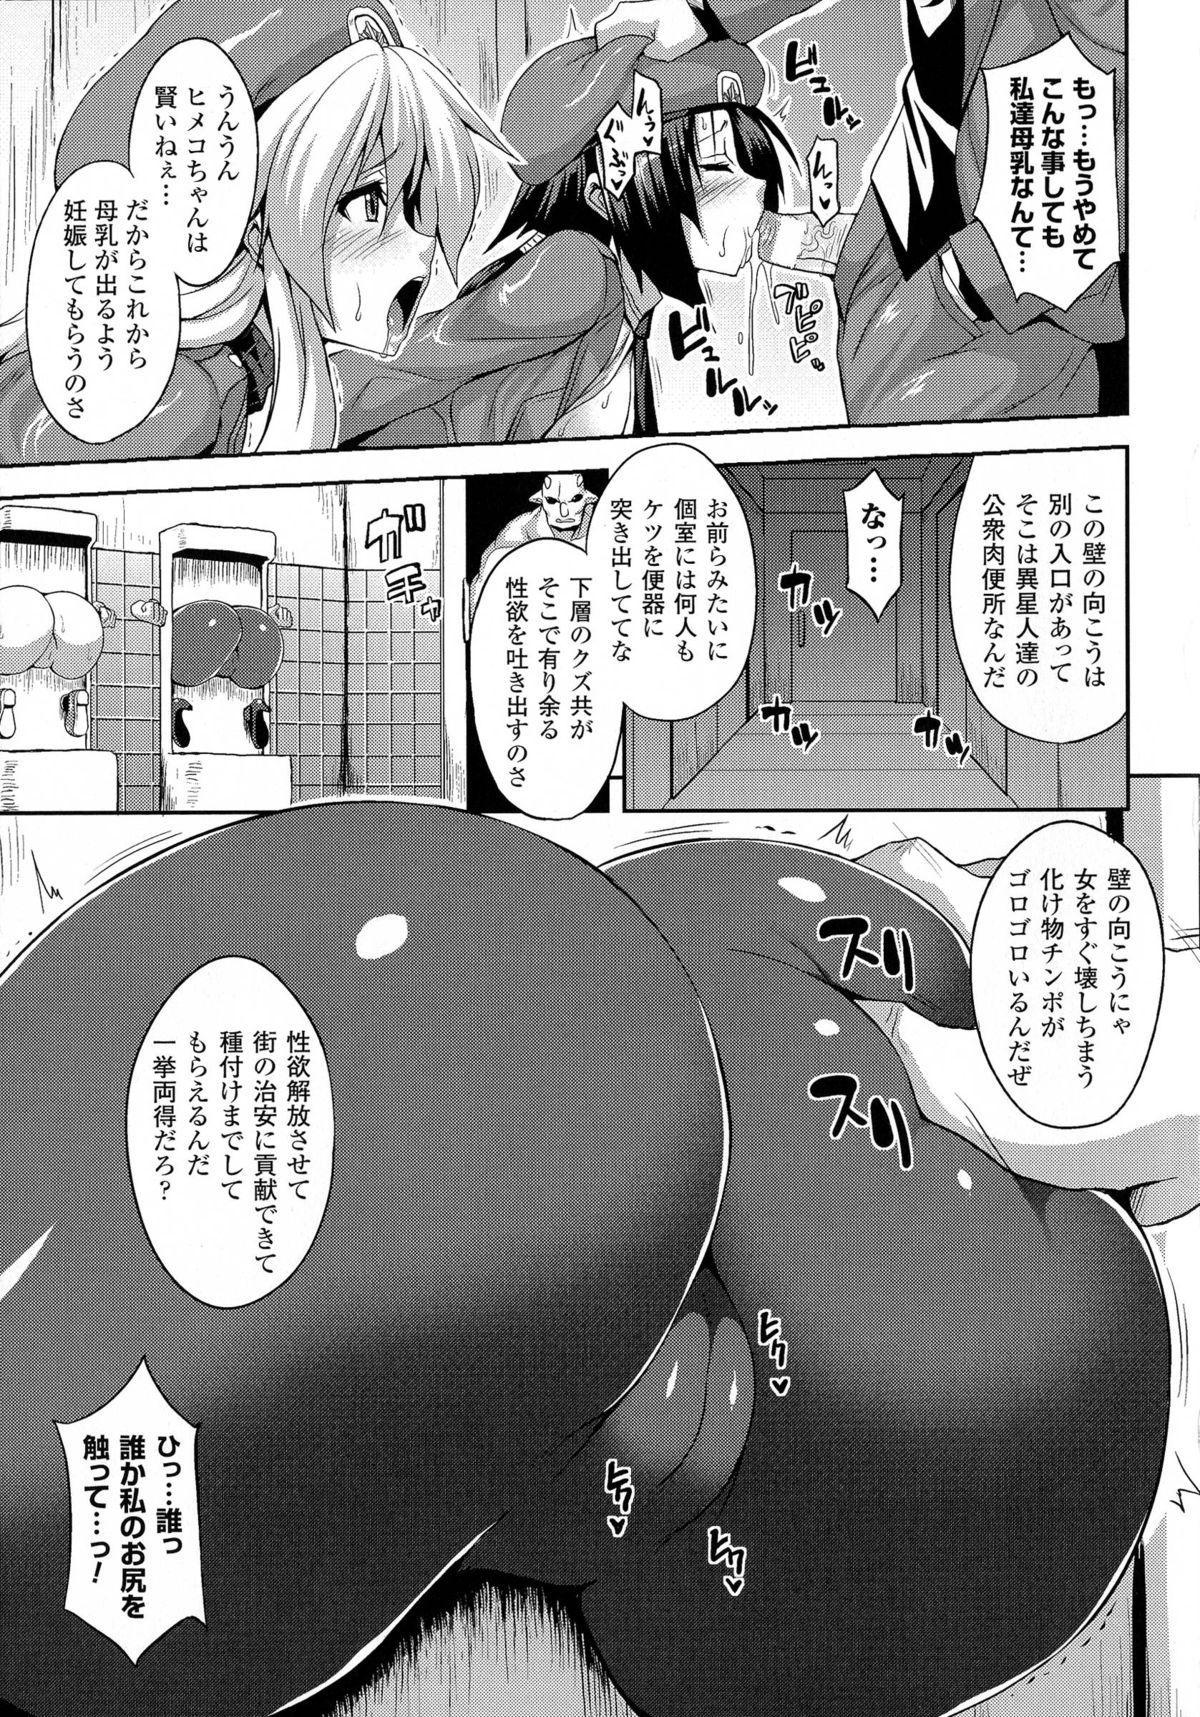 Angel Fall: Tengoku e to Ochiru Otome-tachi 74